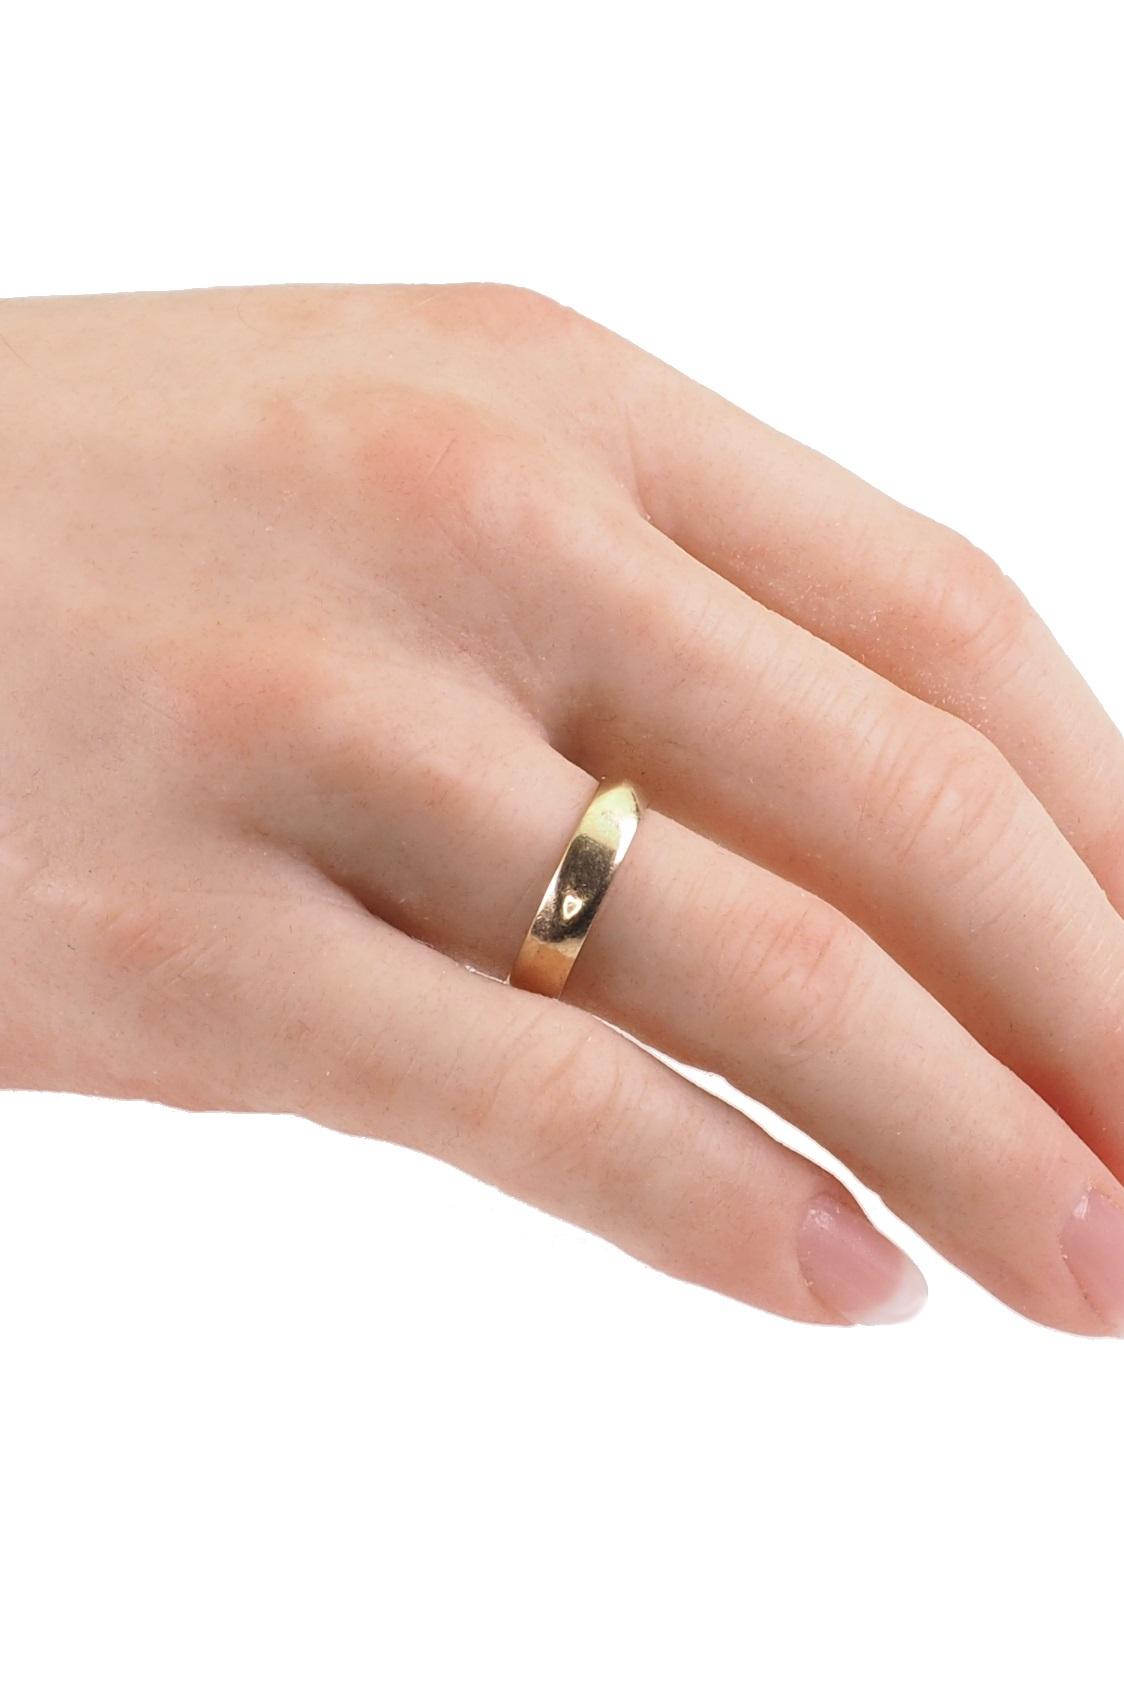 2368-Ringhand